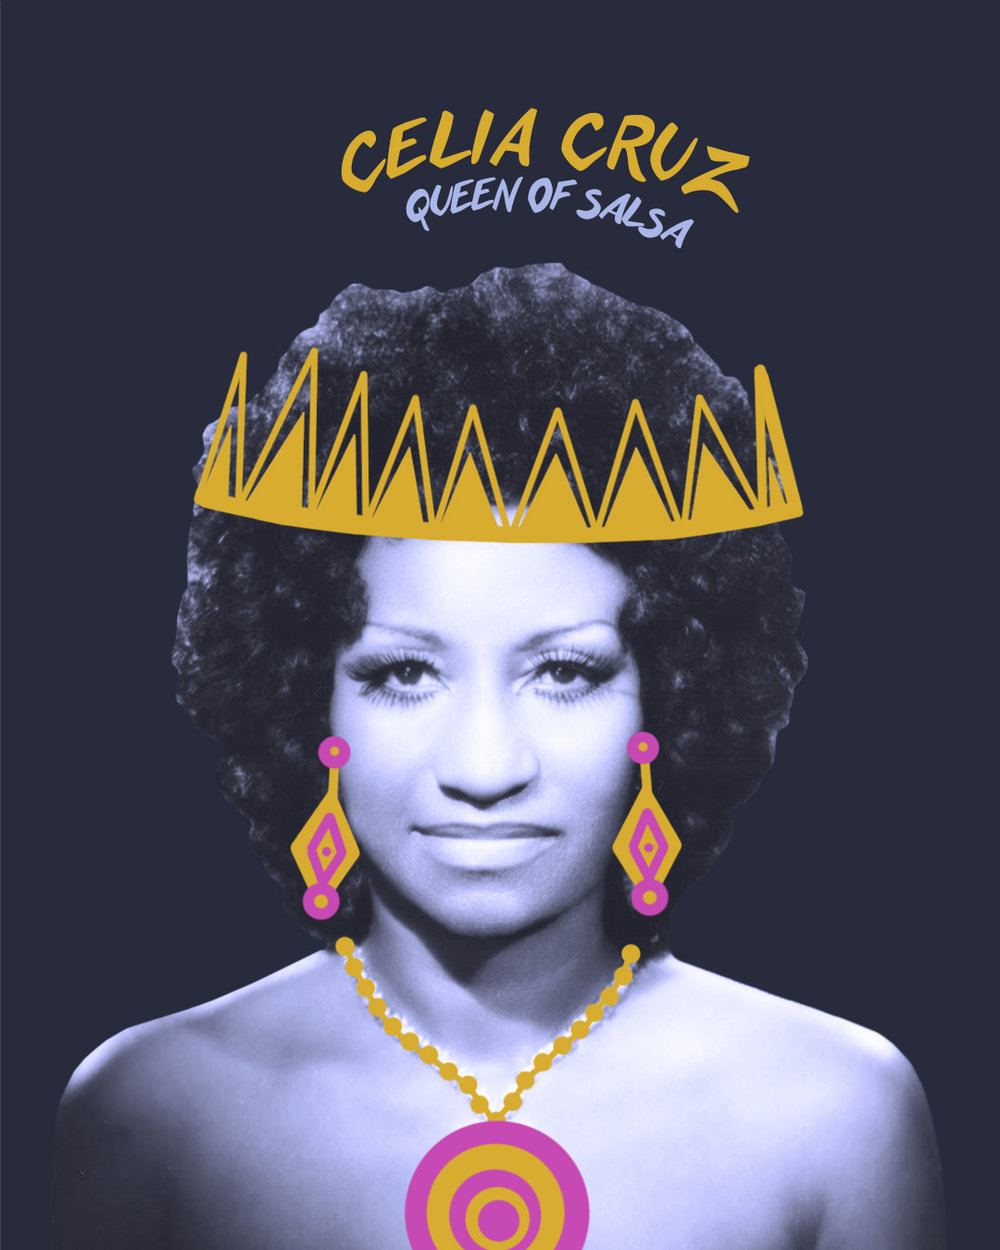 Celia_Cruz.jpg